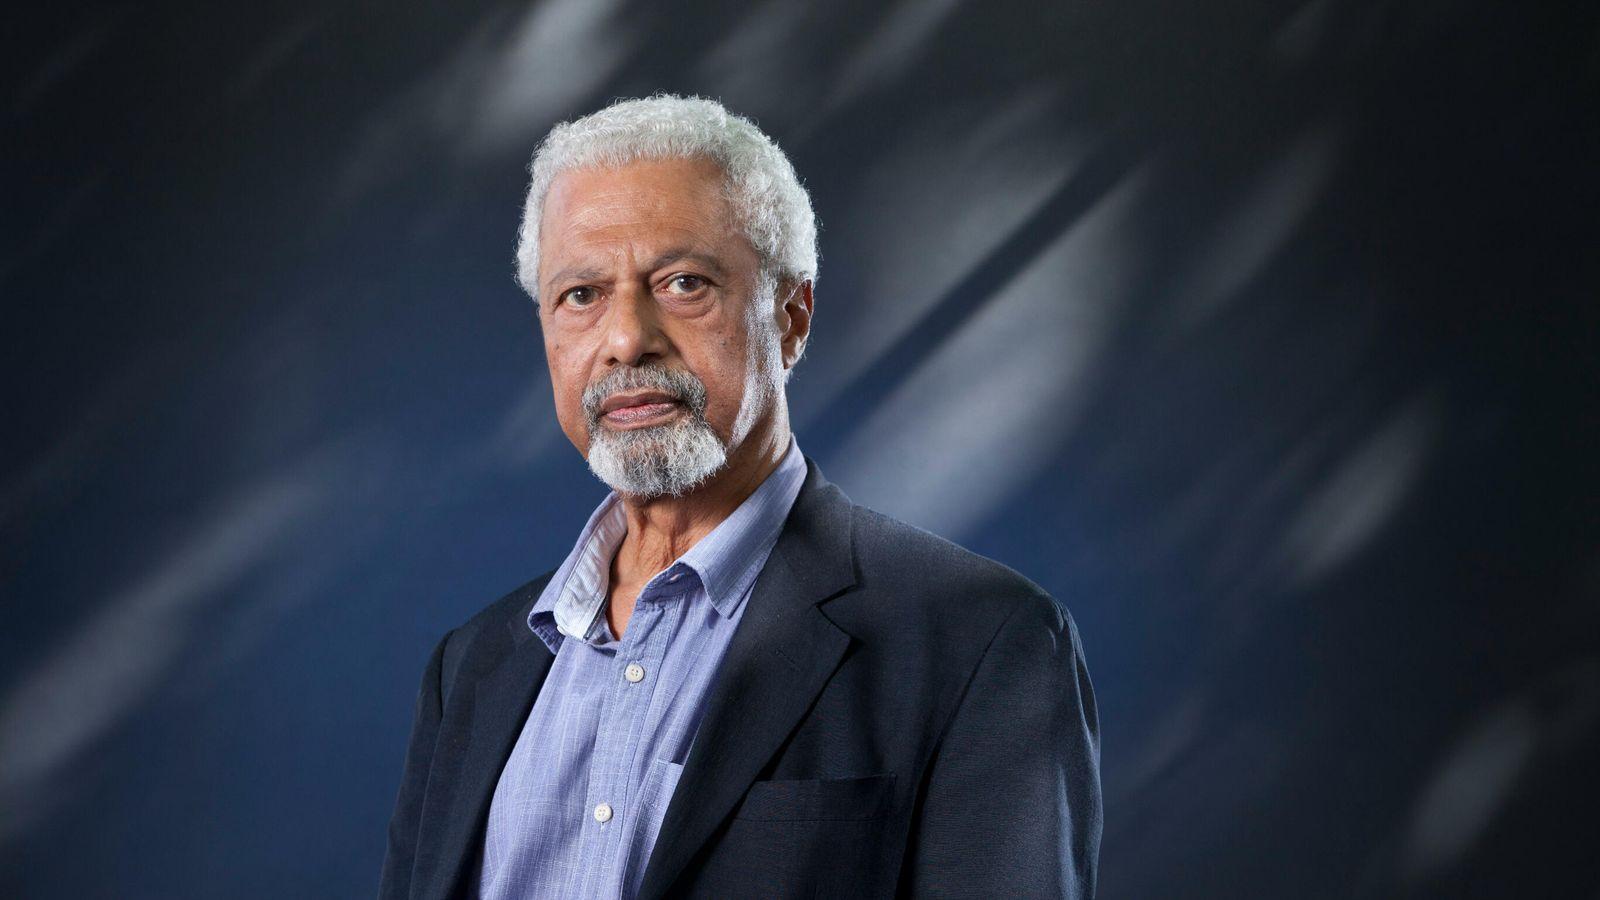 Tanzanian-writer-Abdulrazak-Gurnah-awarded-Nobel-Prize-for-literature